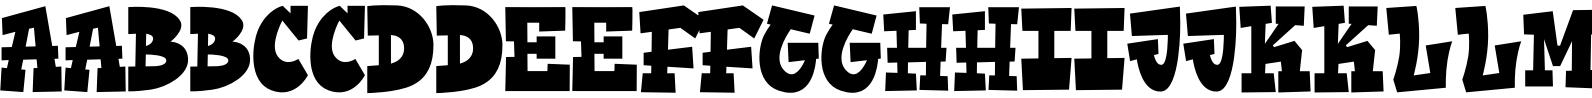 Aerock